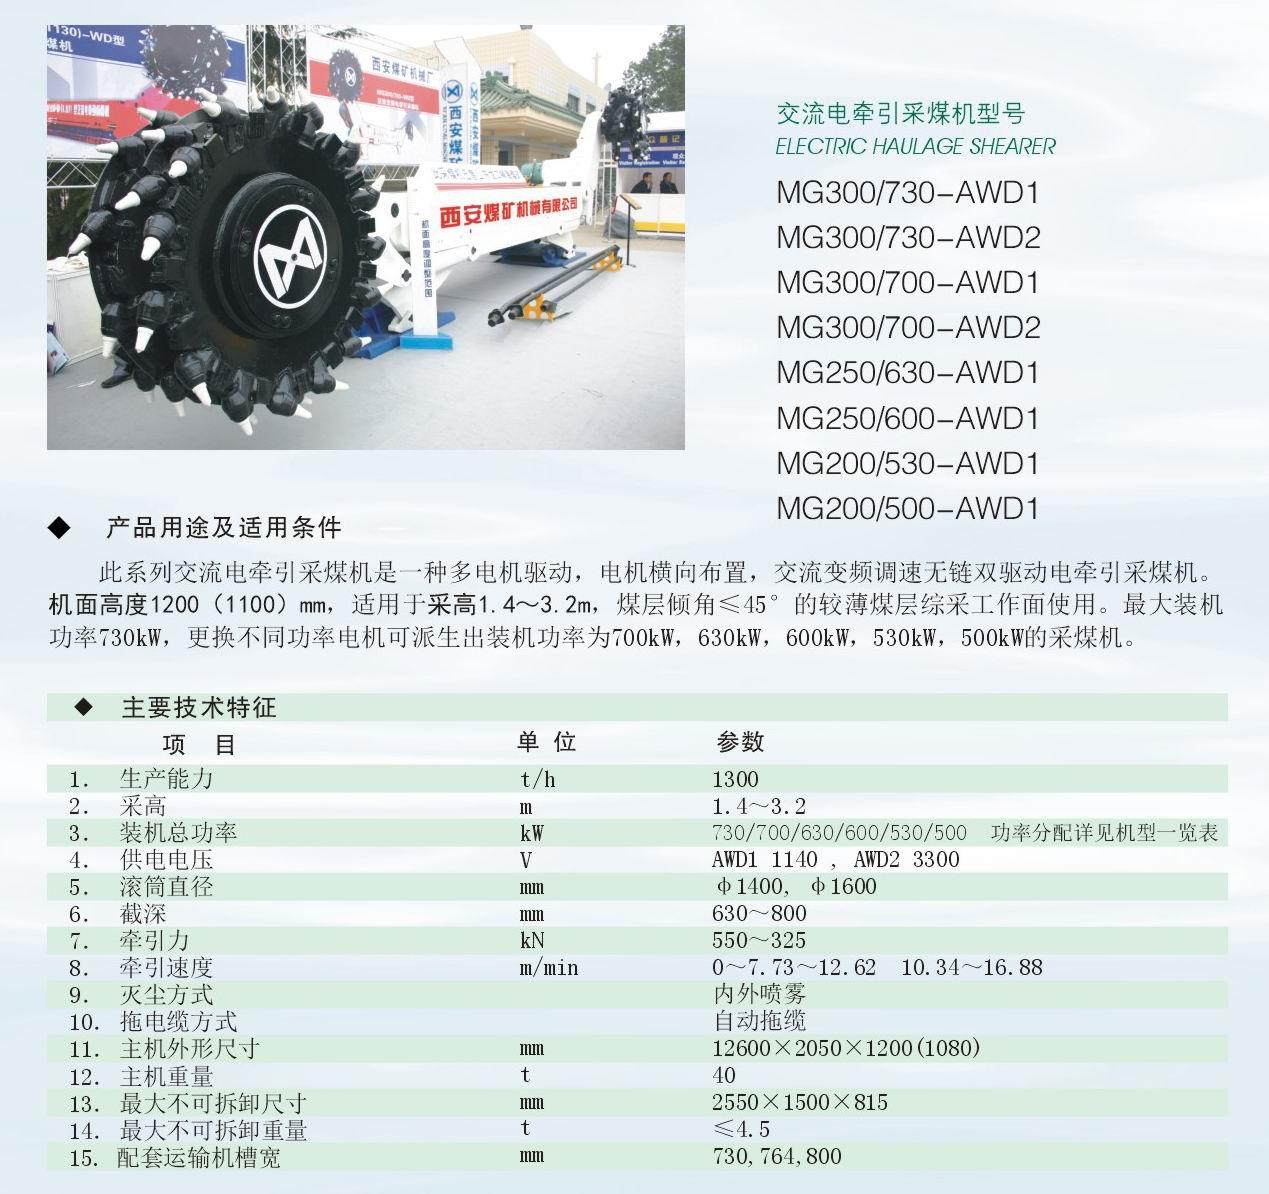 mg300/730-awd型系列交流电牵引采煤机